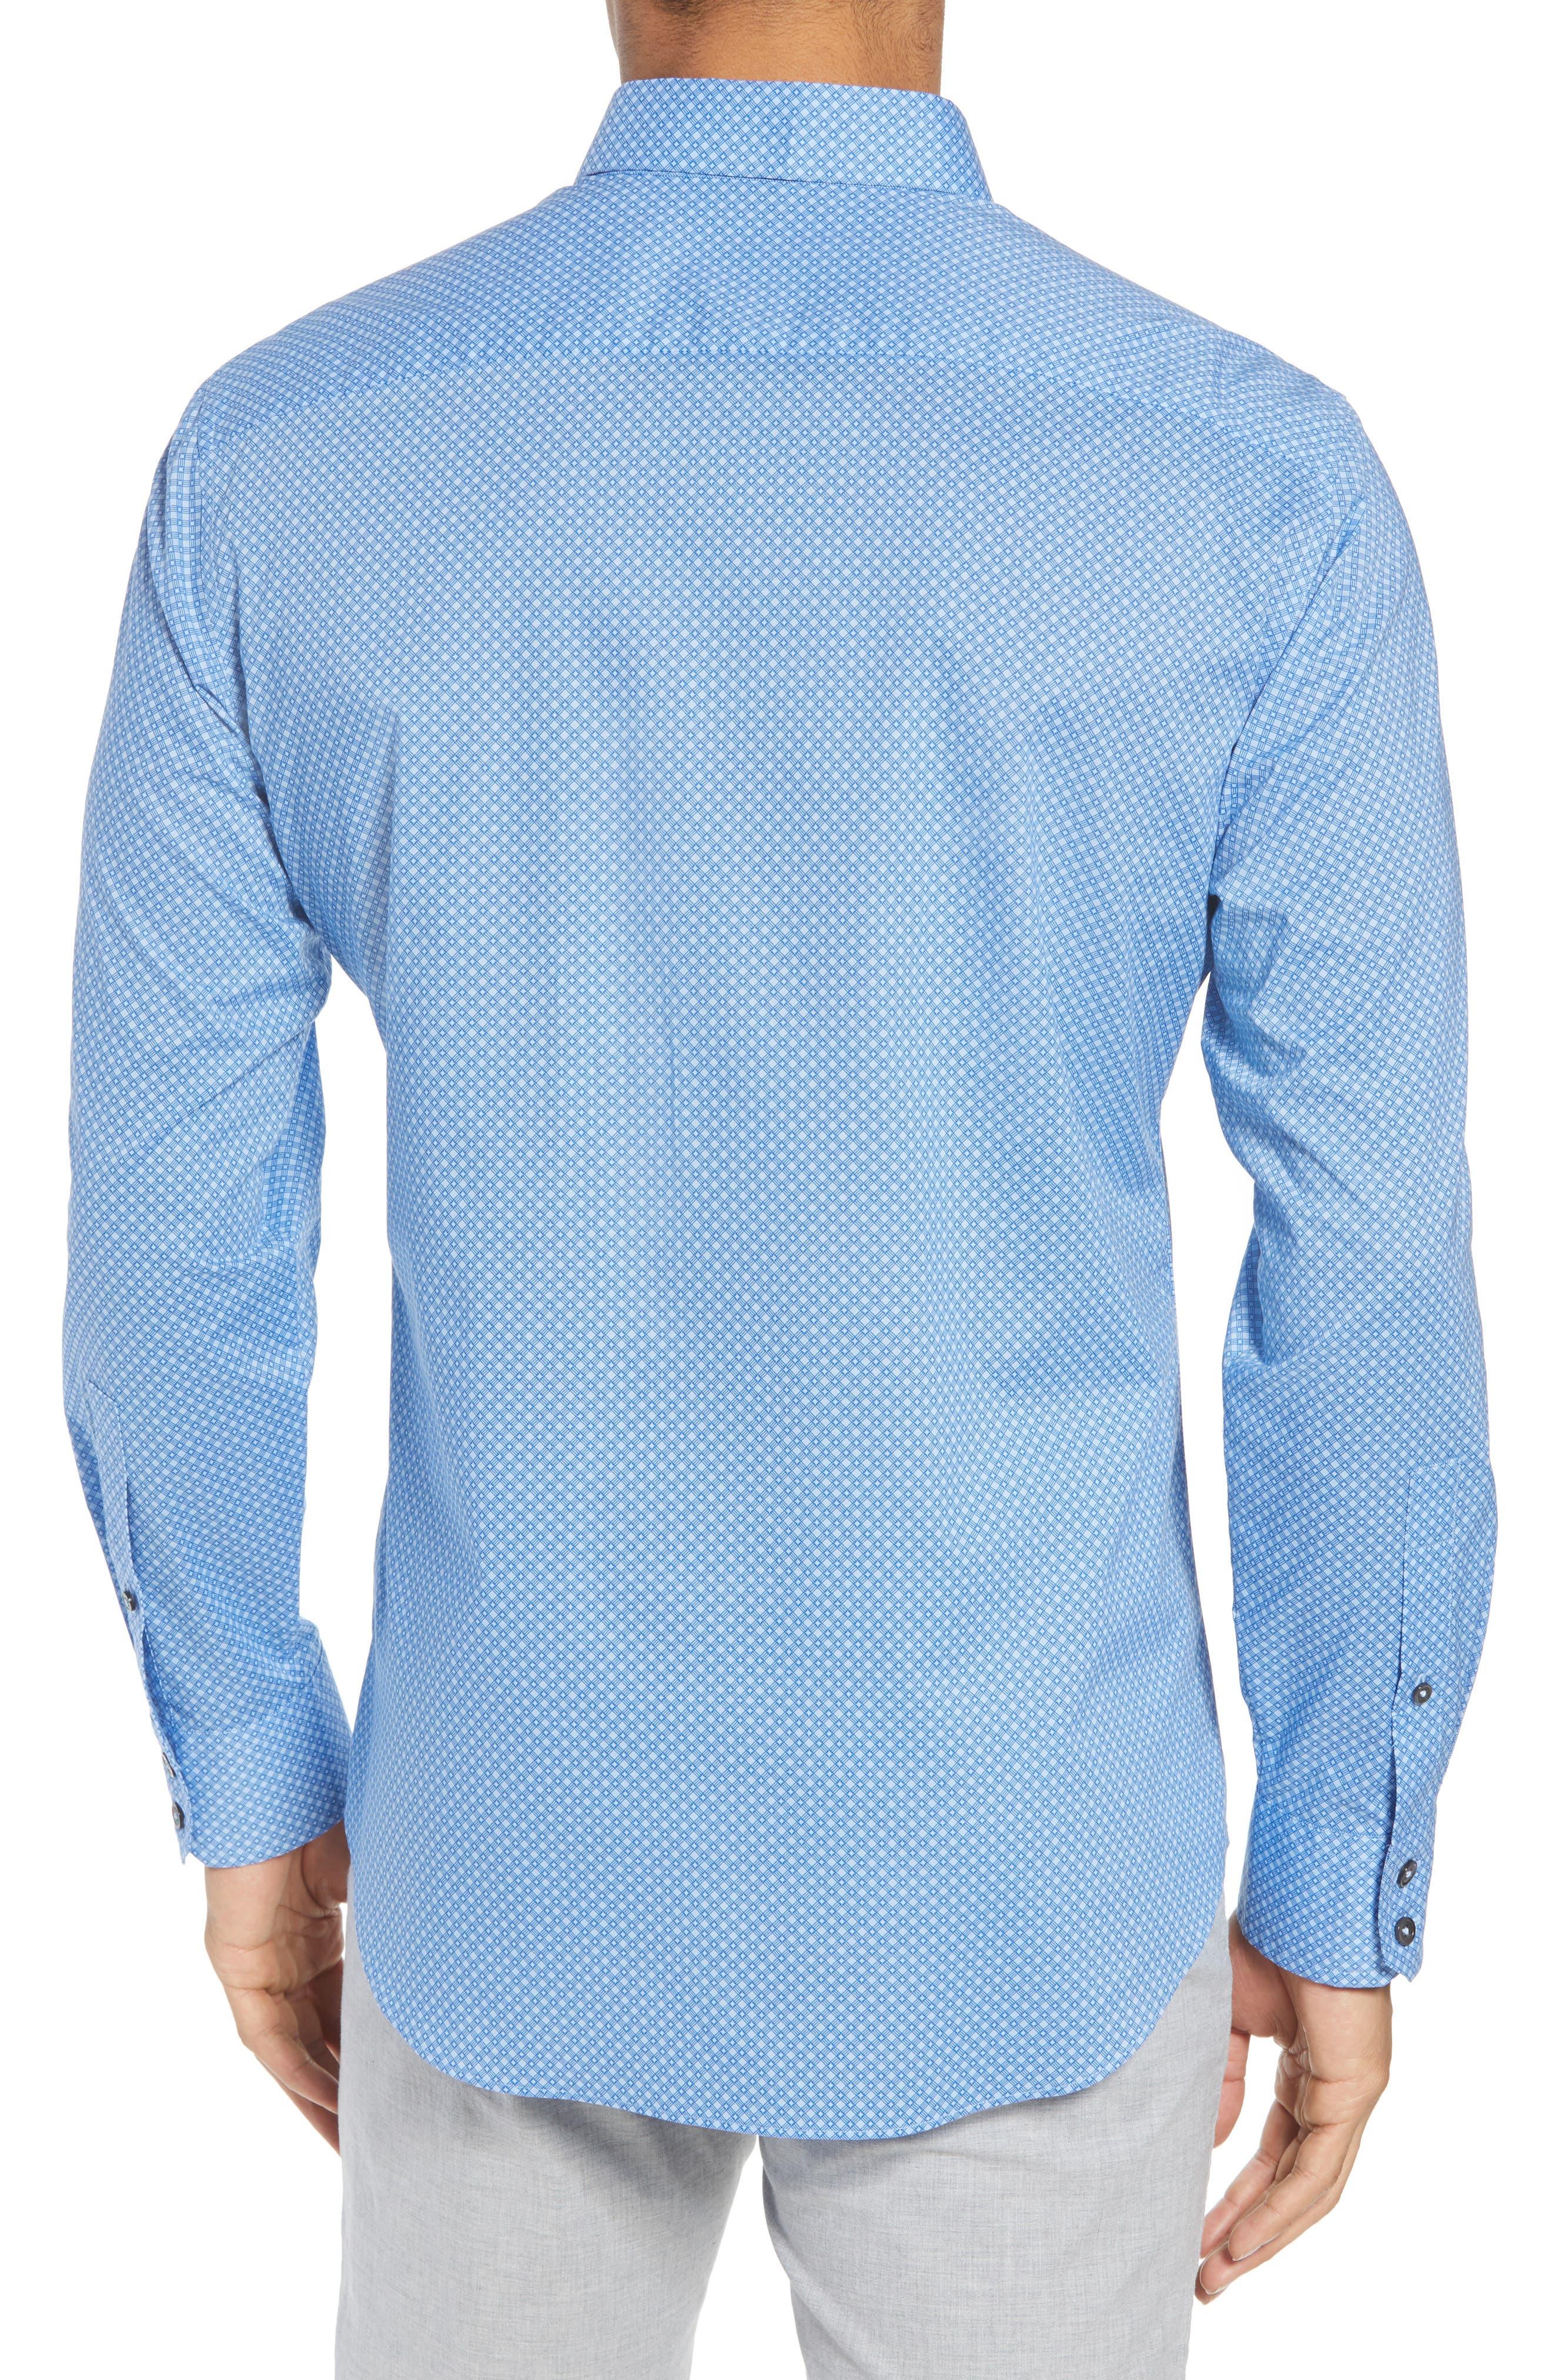 Ethan Slim Fit Sport Shirt,                             Alternate thumbnail 2, color,                             400